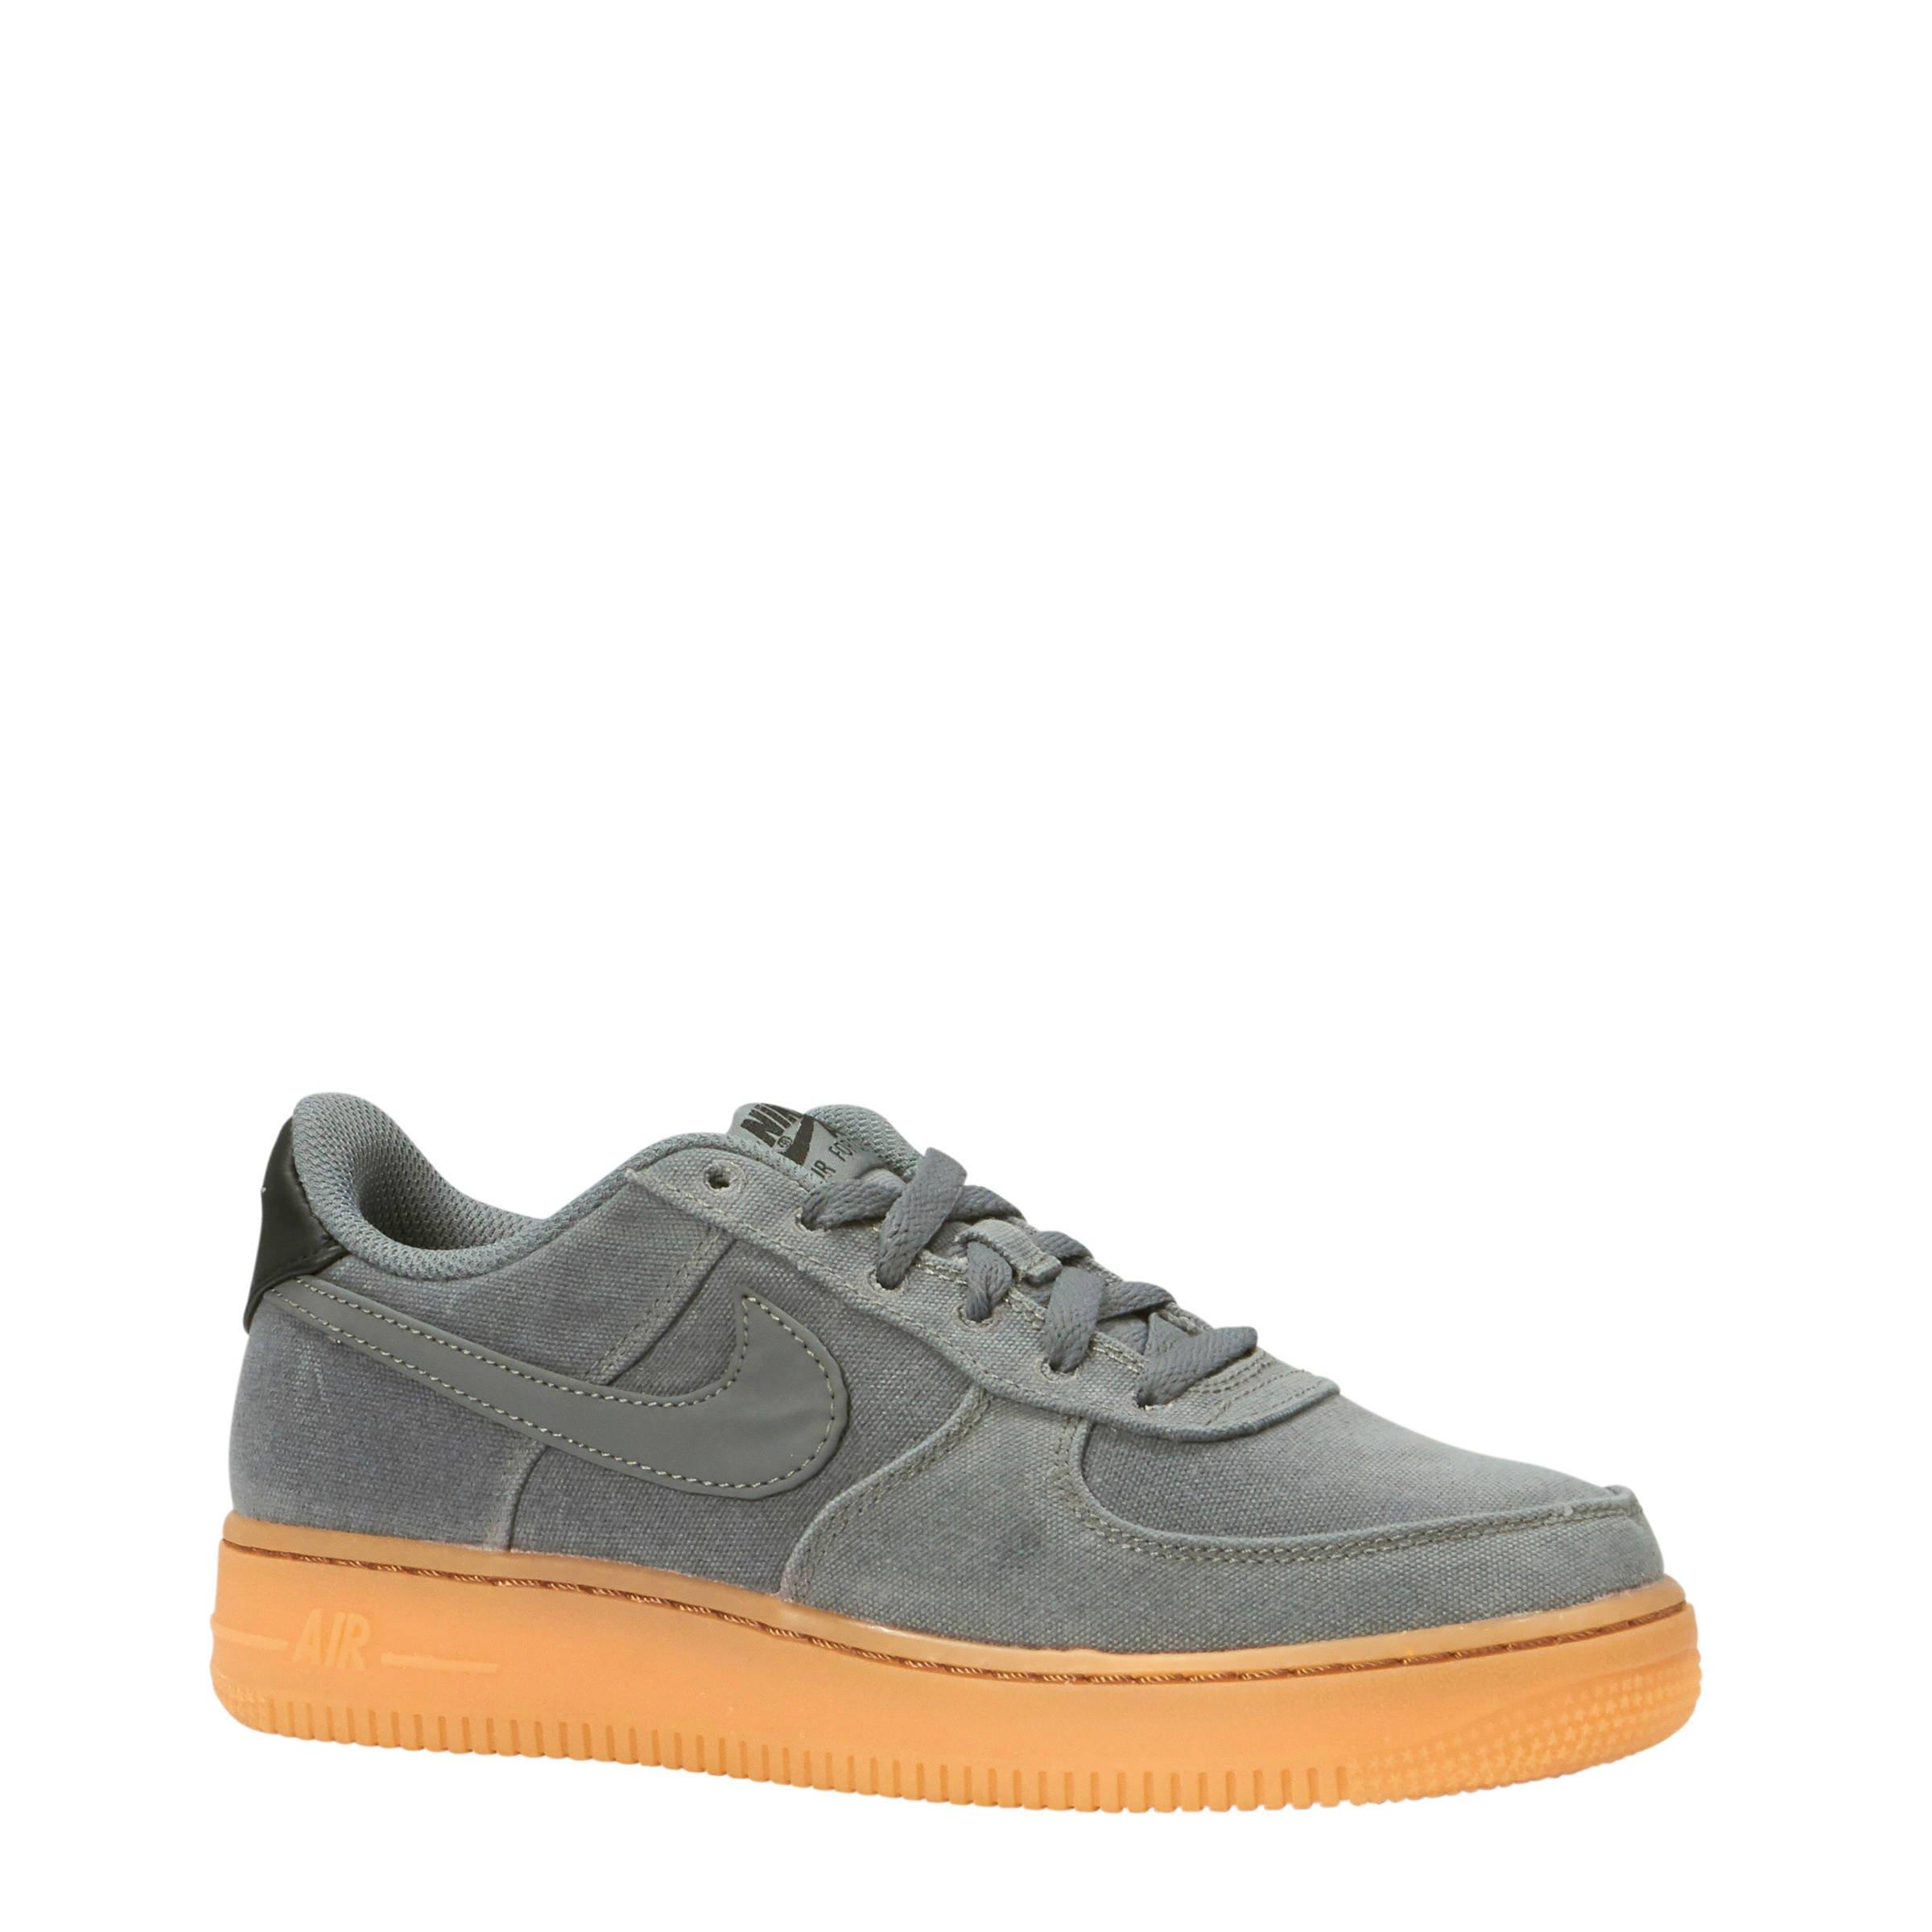 1115484c843 Nike sneaker Air Force 1 LV8 Style grijs   wehkamp